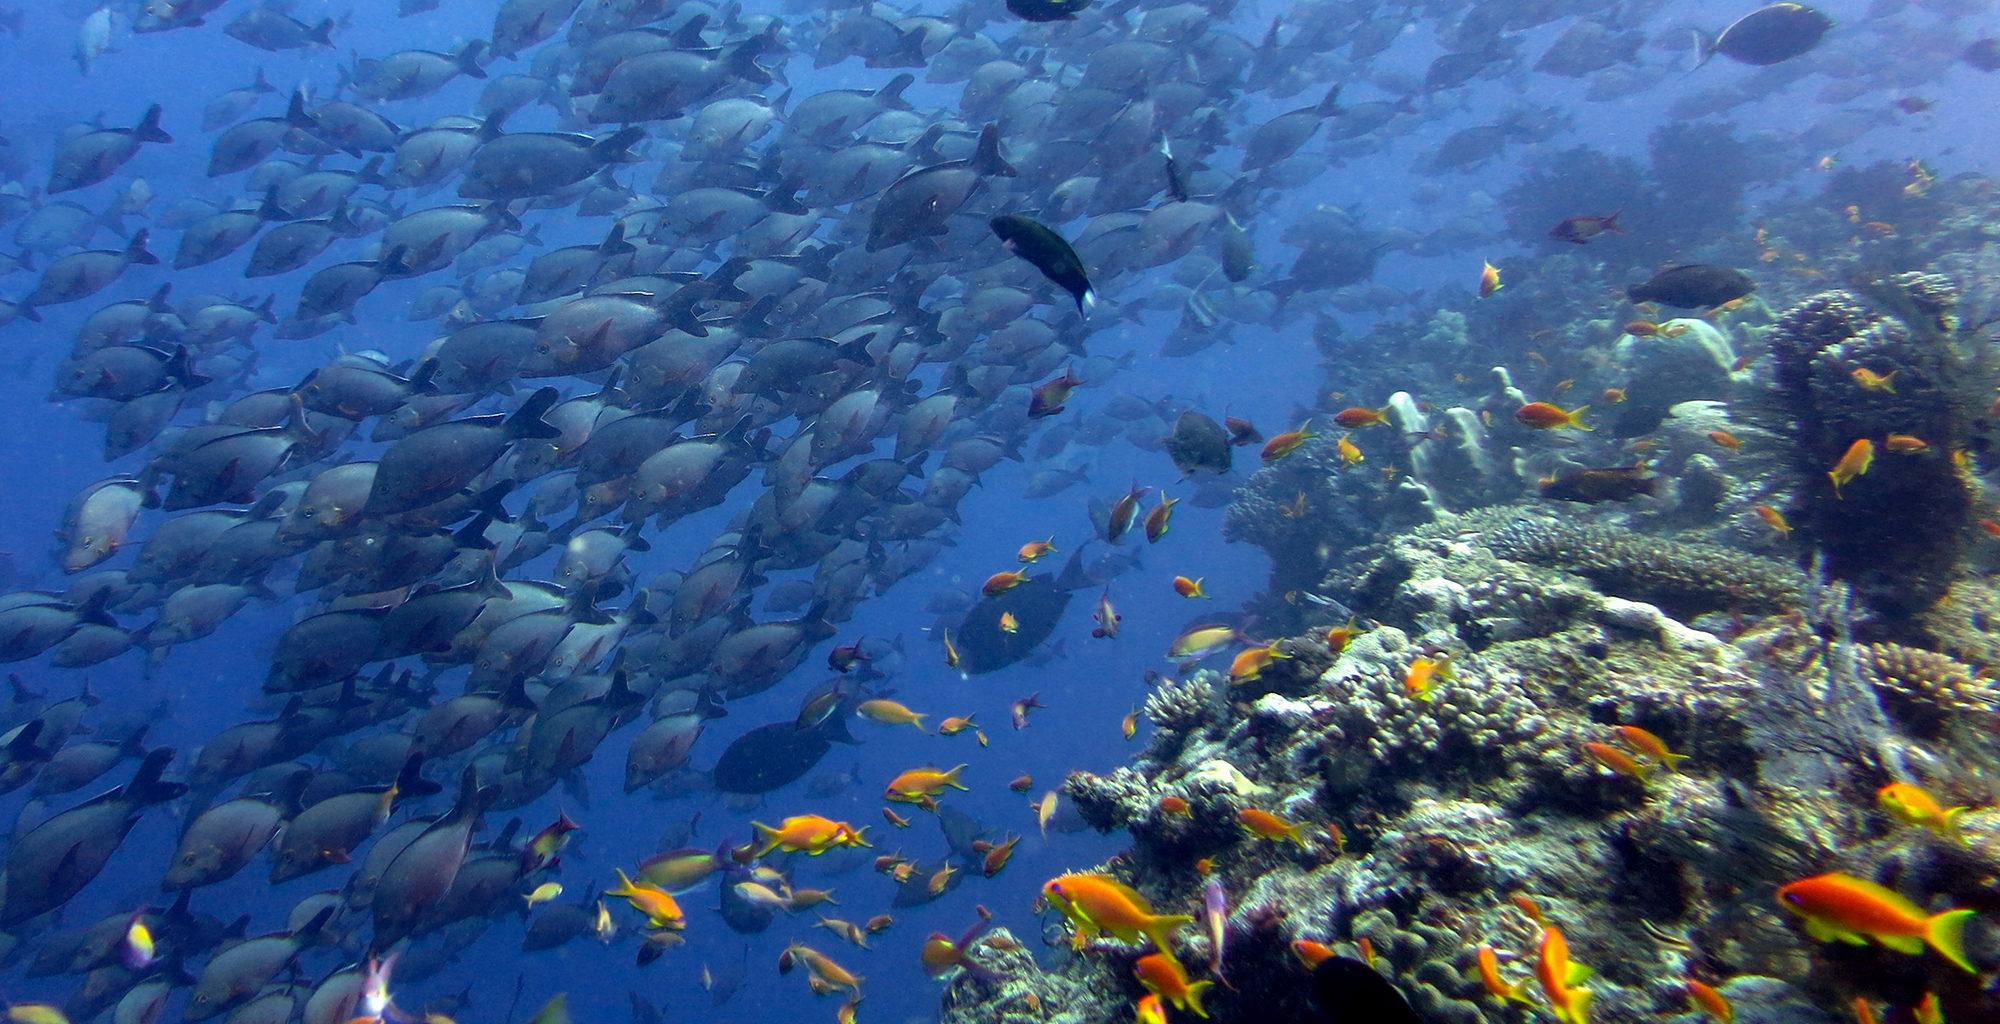 Mozambique-Quirimbas-Archipelago-Sealife-Scuba-Dive